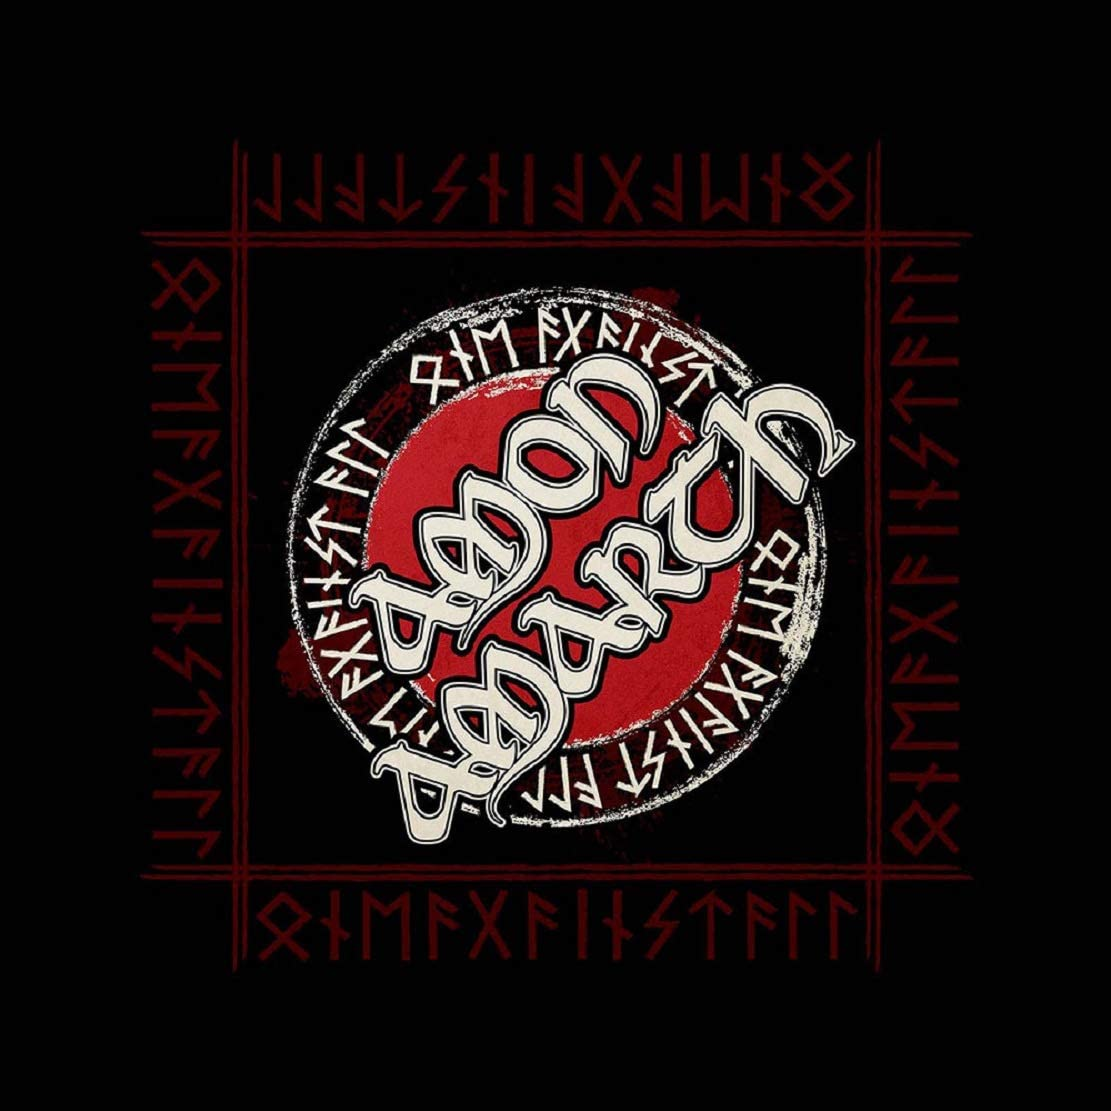 for-collectors-only Amon Amarth Bandana Runen Logo Kopftuch Tuch One Against All Hat Kopfbedeckung